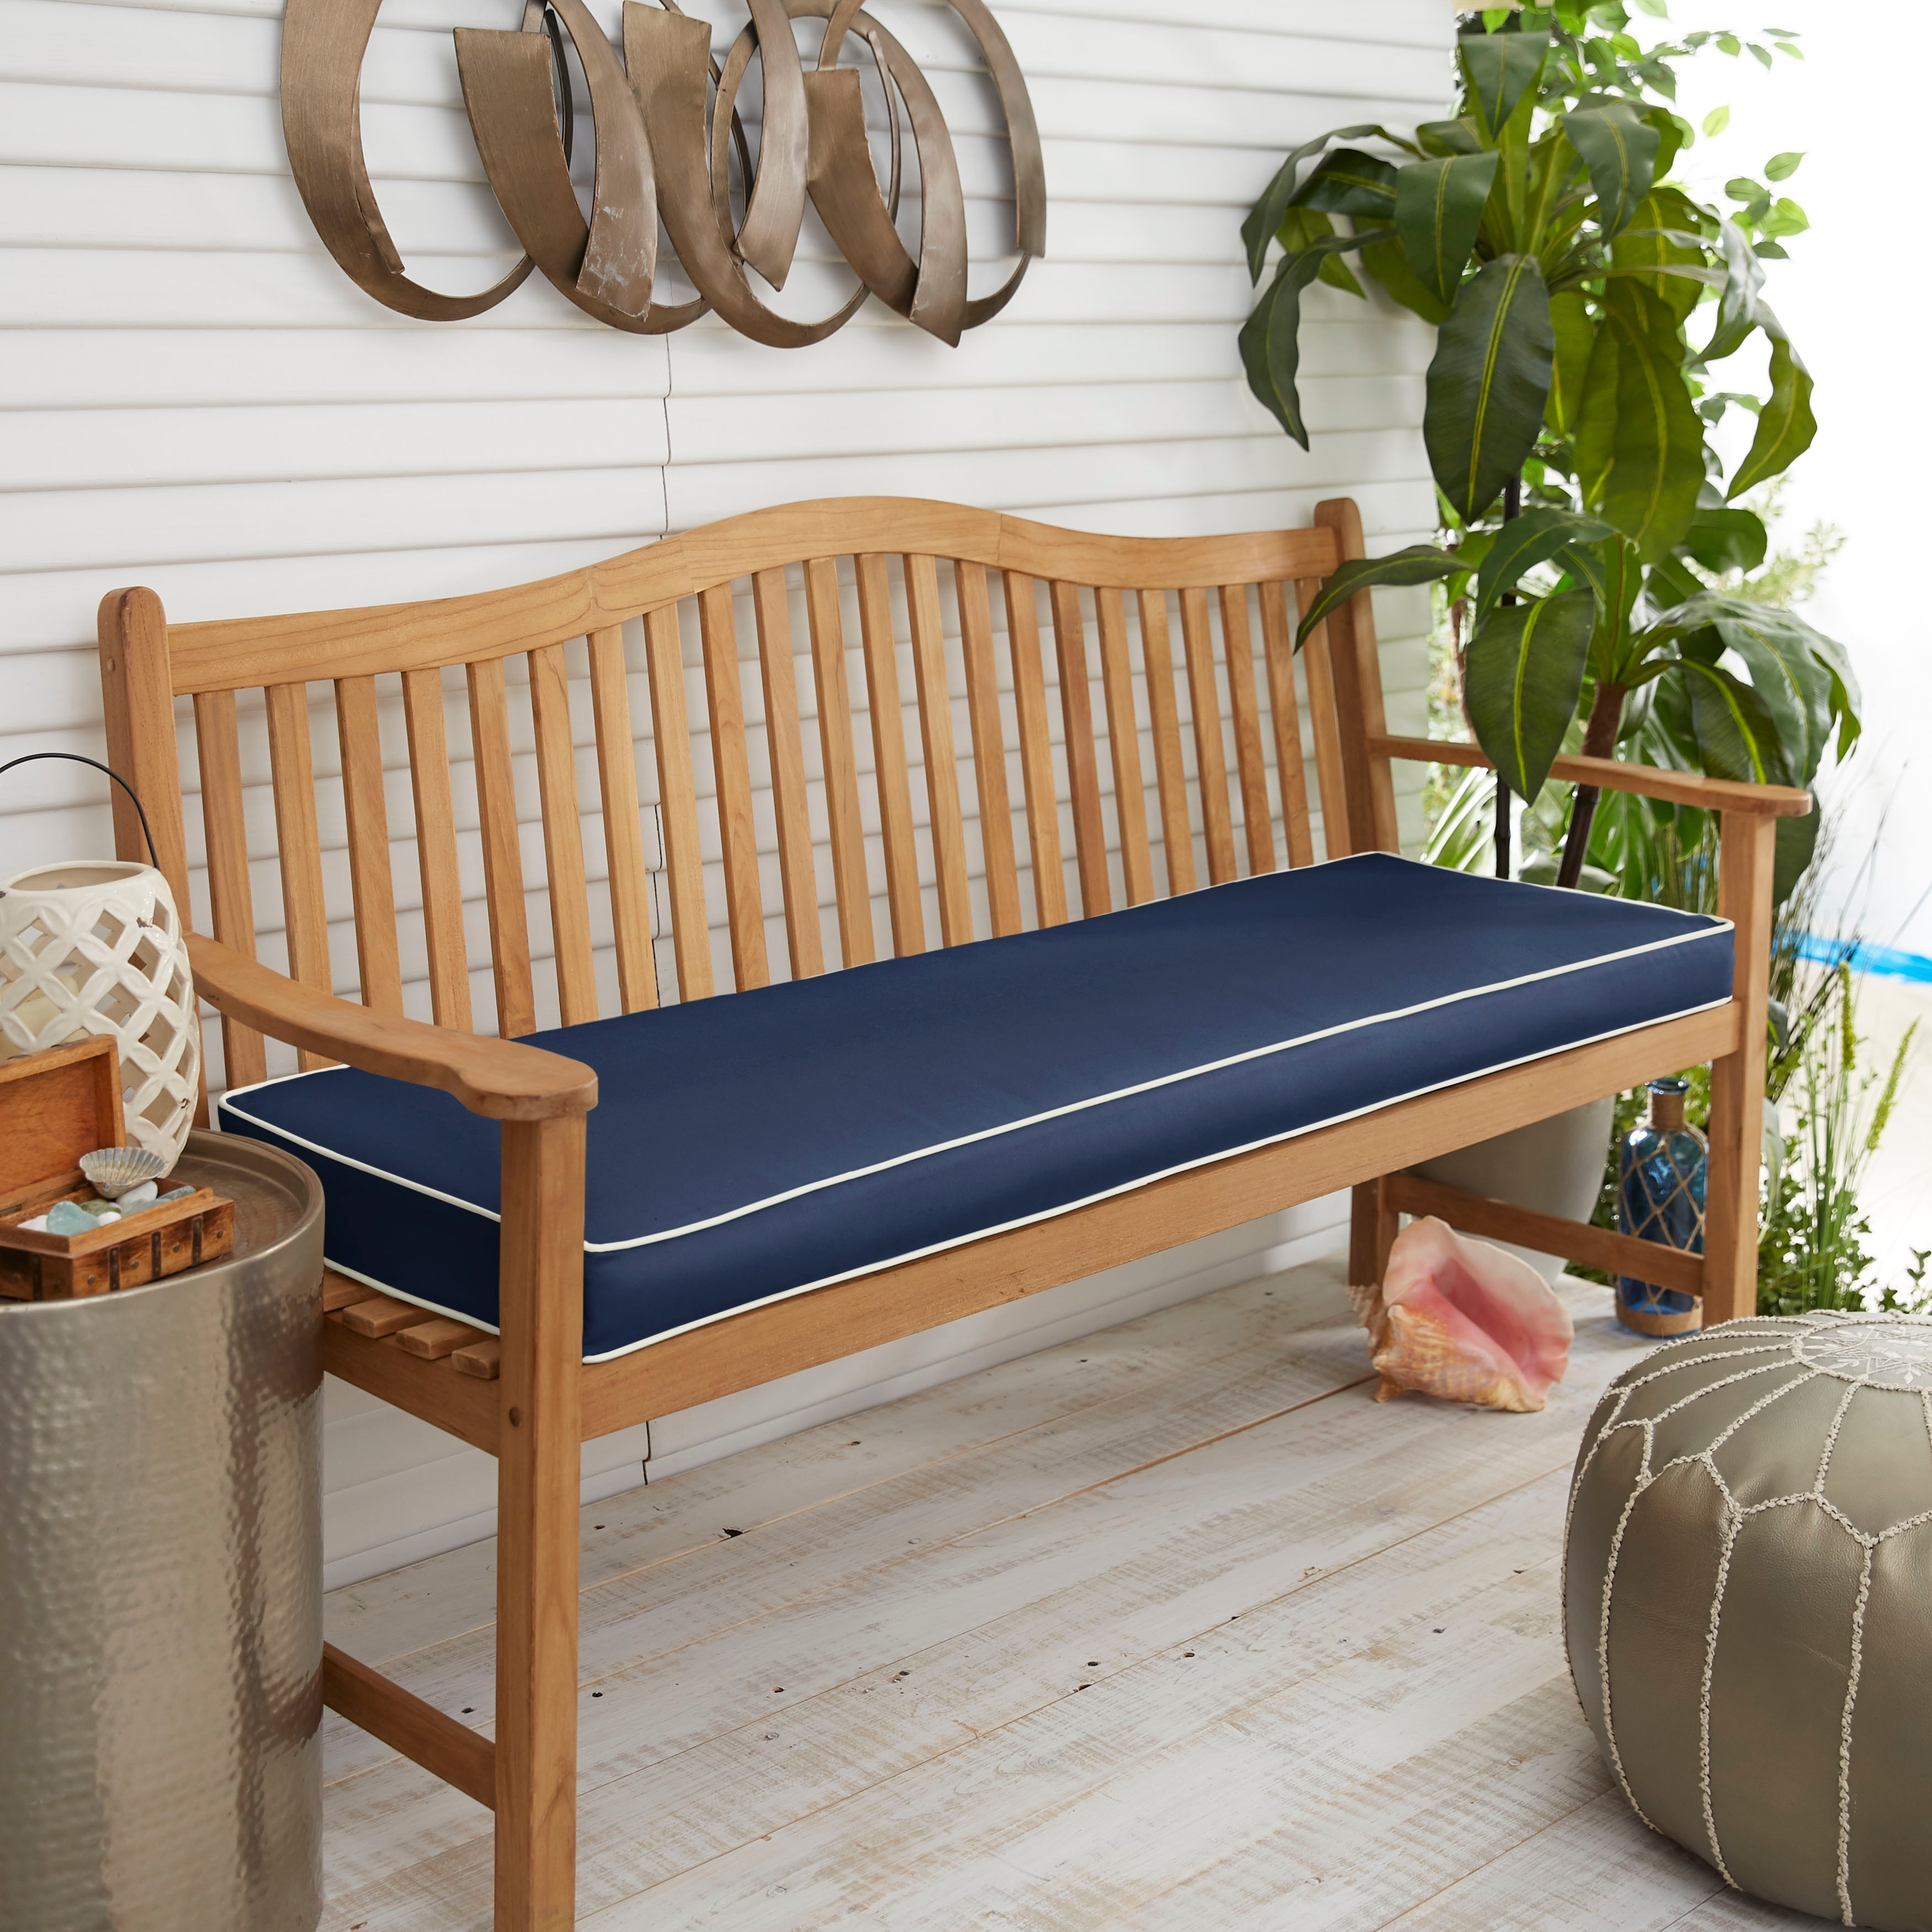 Sawyer Sunbrella Canvas Navy With Canvas Cording Indoor Outdoor Bench Cushion Overstock 14276369